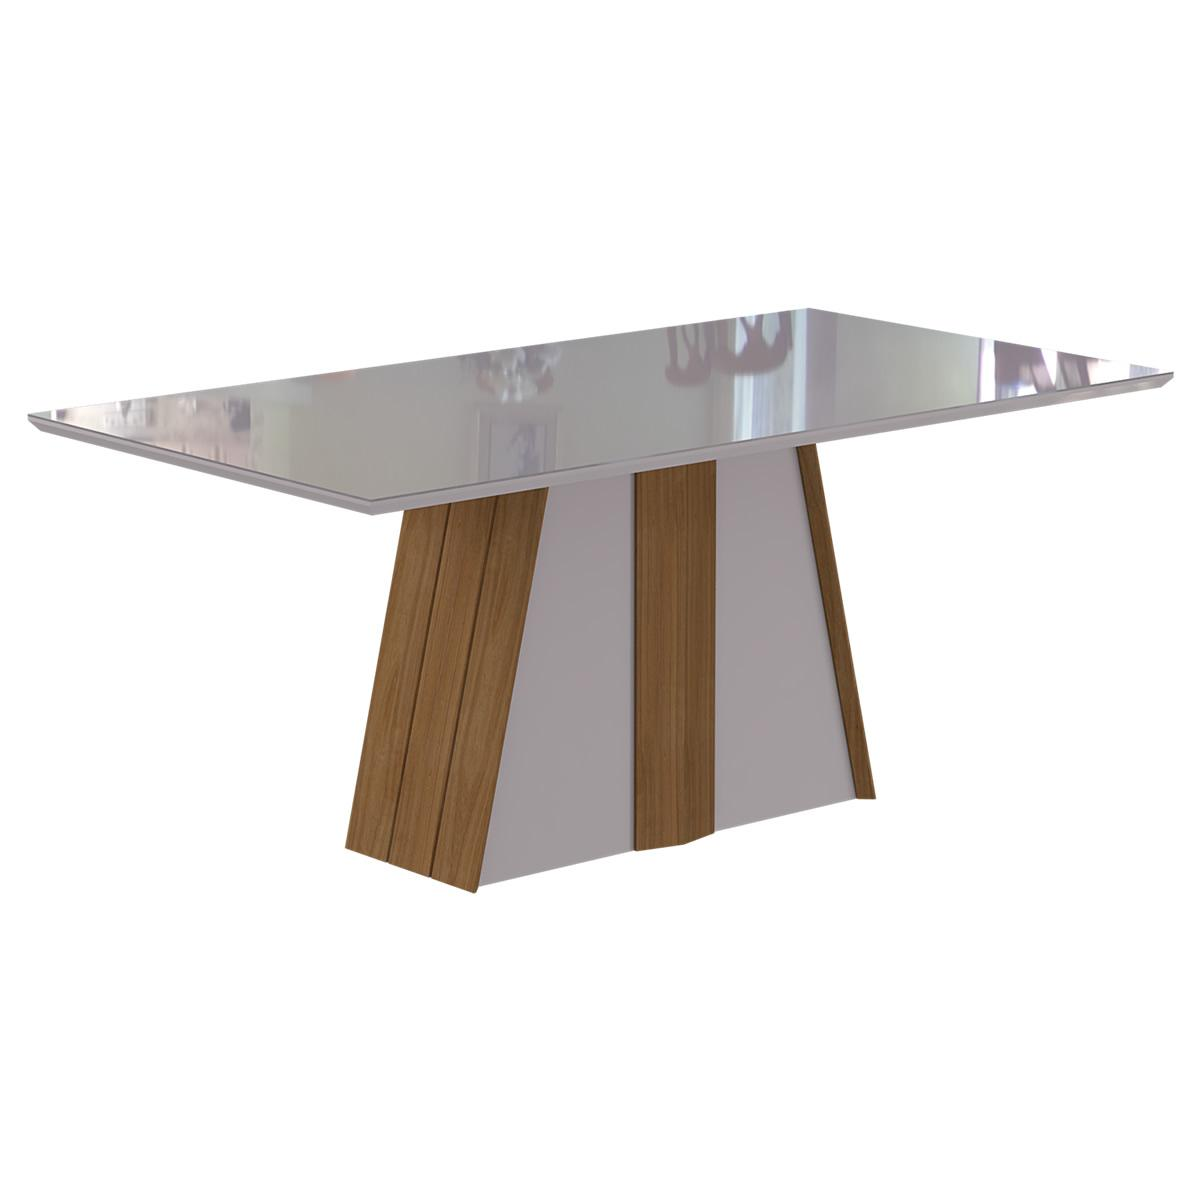 Mesa Daiana 180cm x 90cm - Madeira/Off White - Cimol